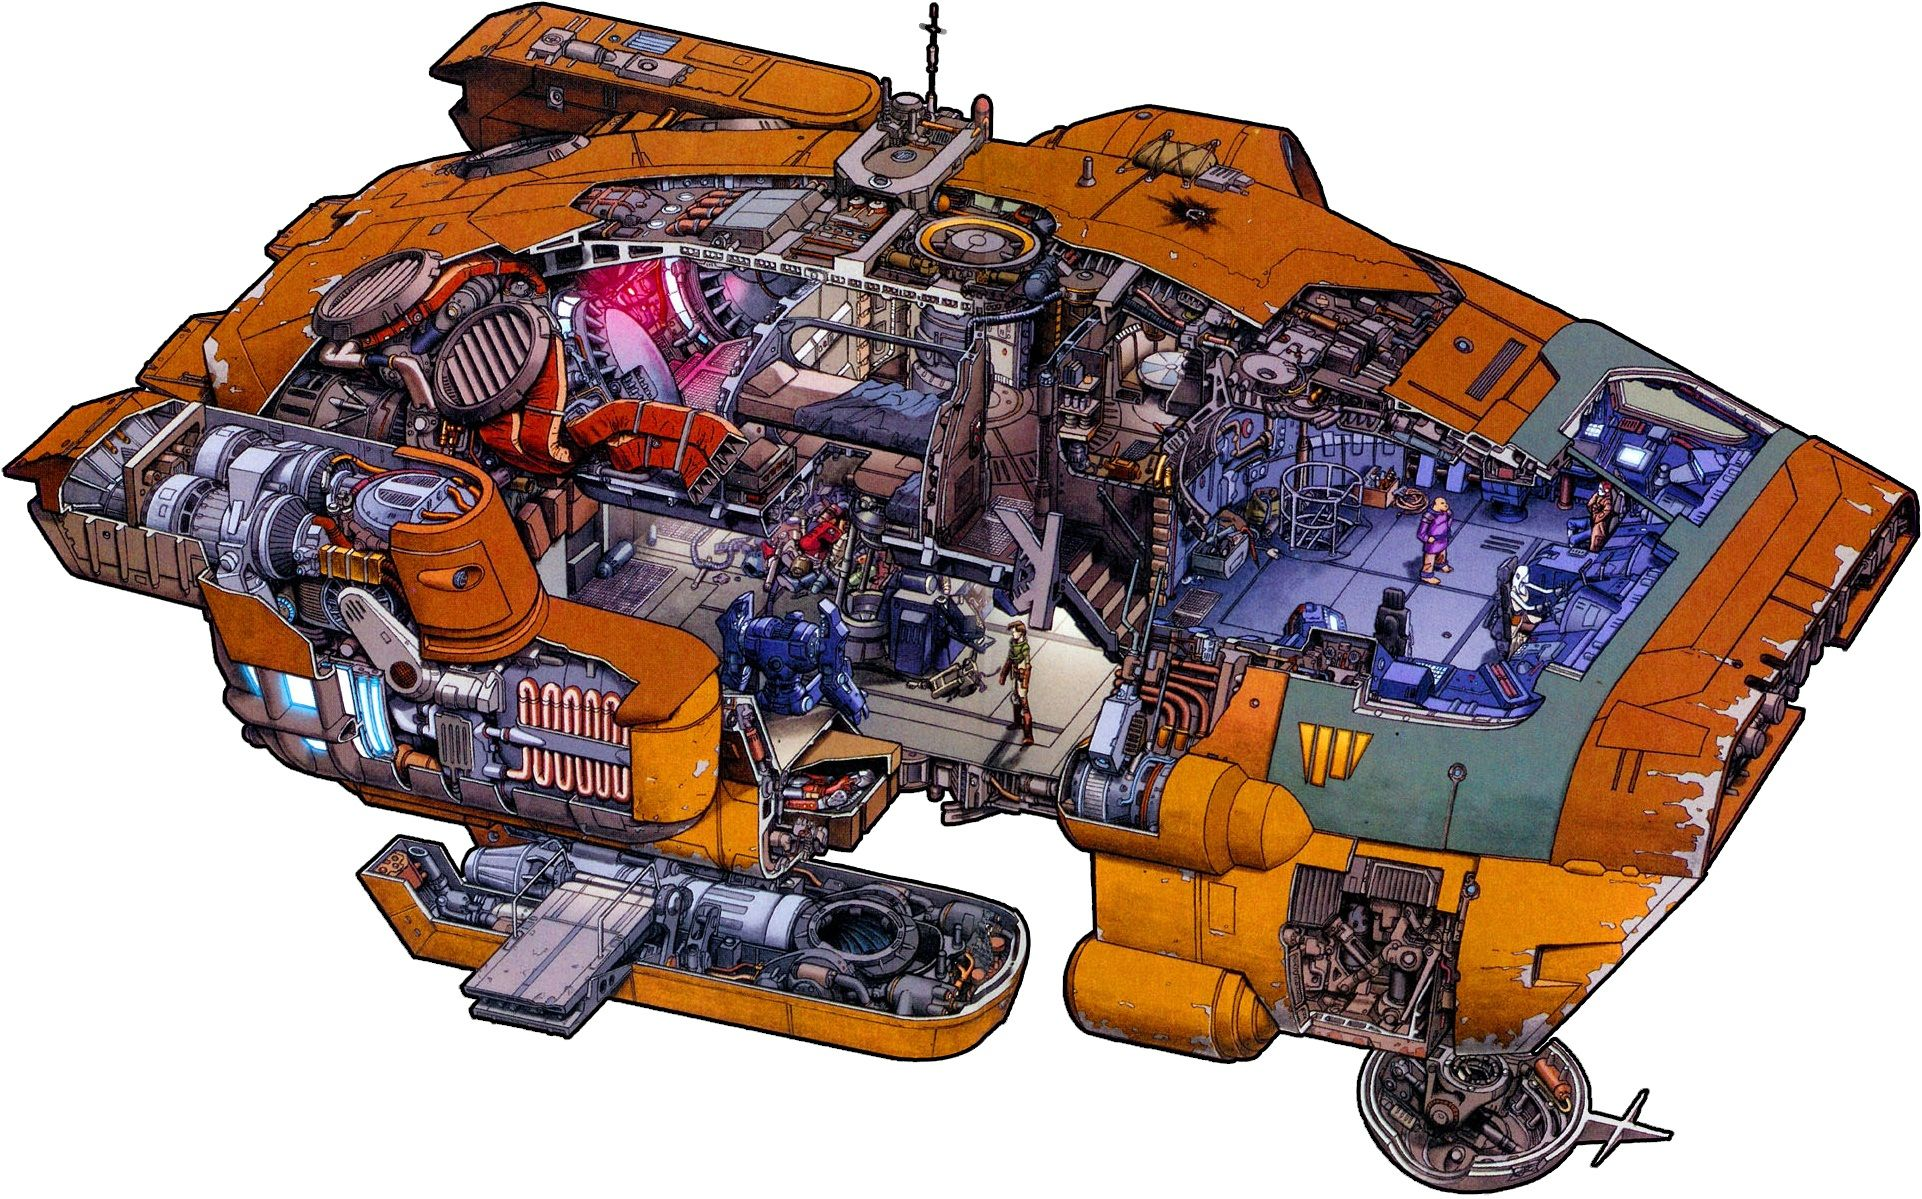 spaceship cutaway diagram kohler stator wiring sci fi cutaways google search technical concept art